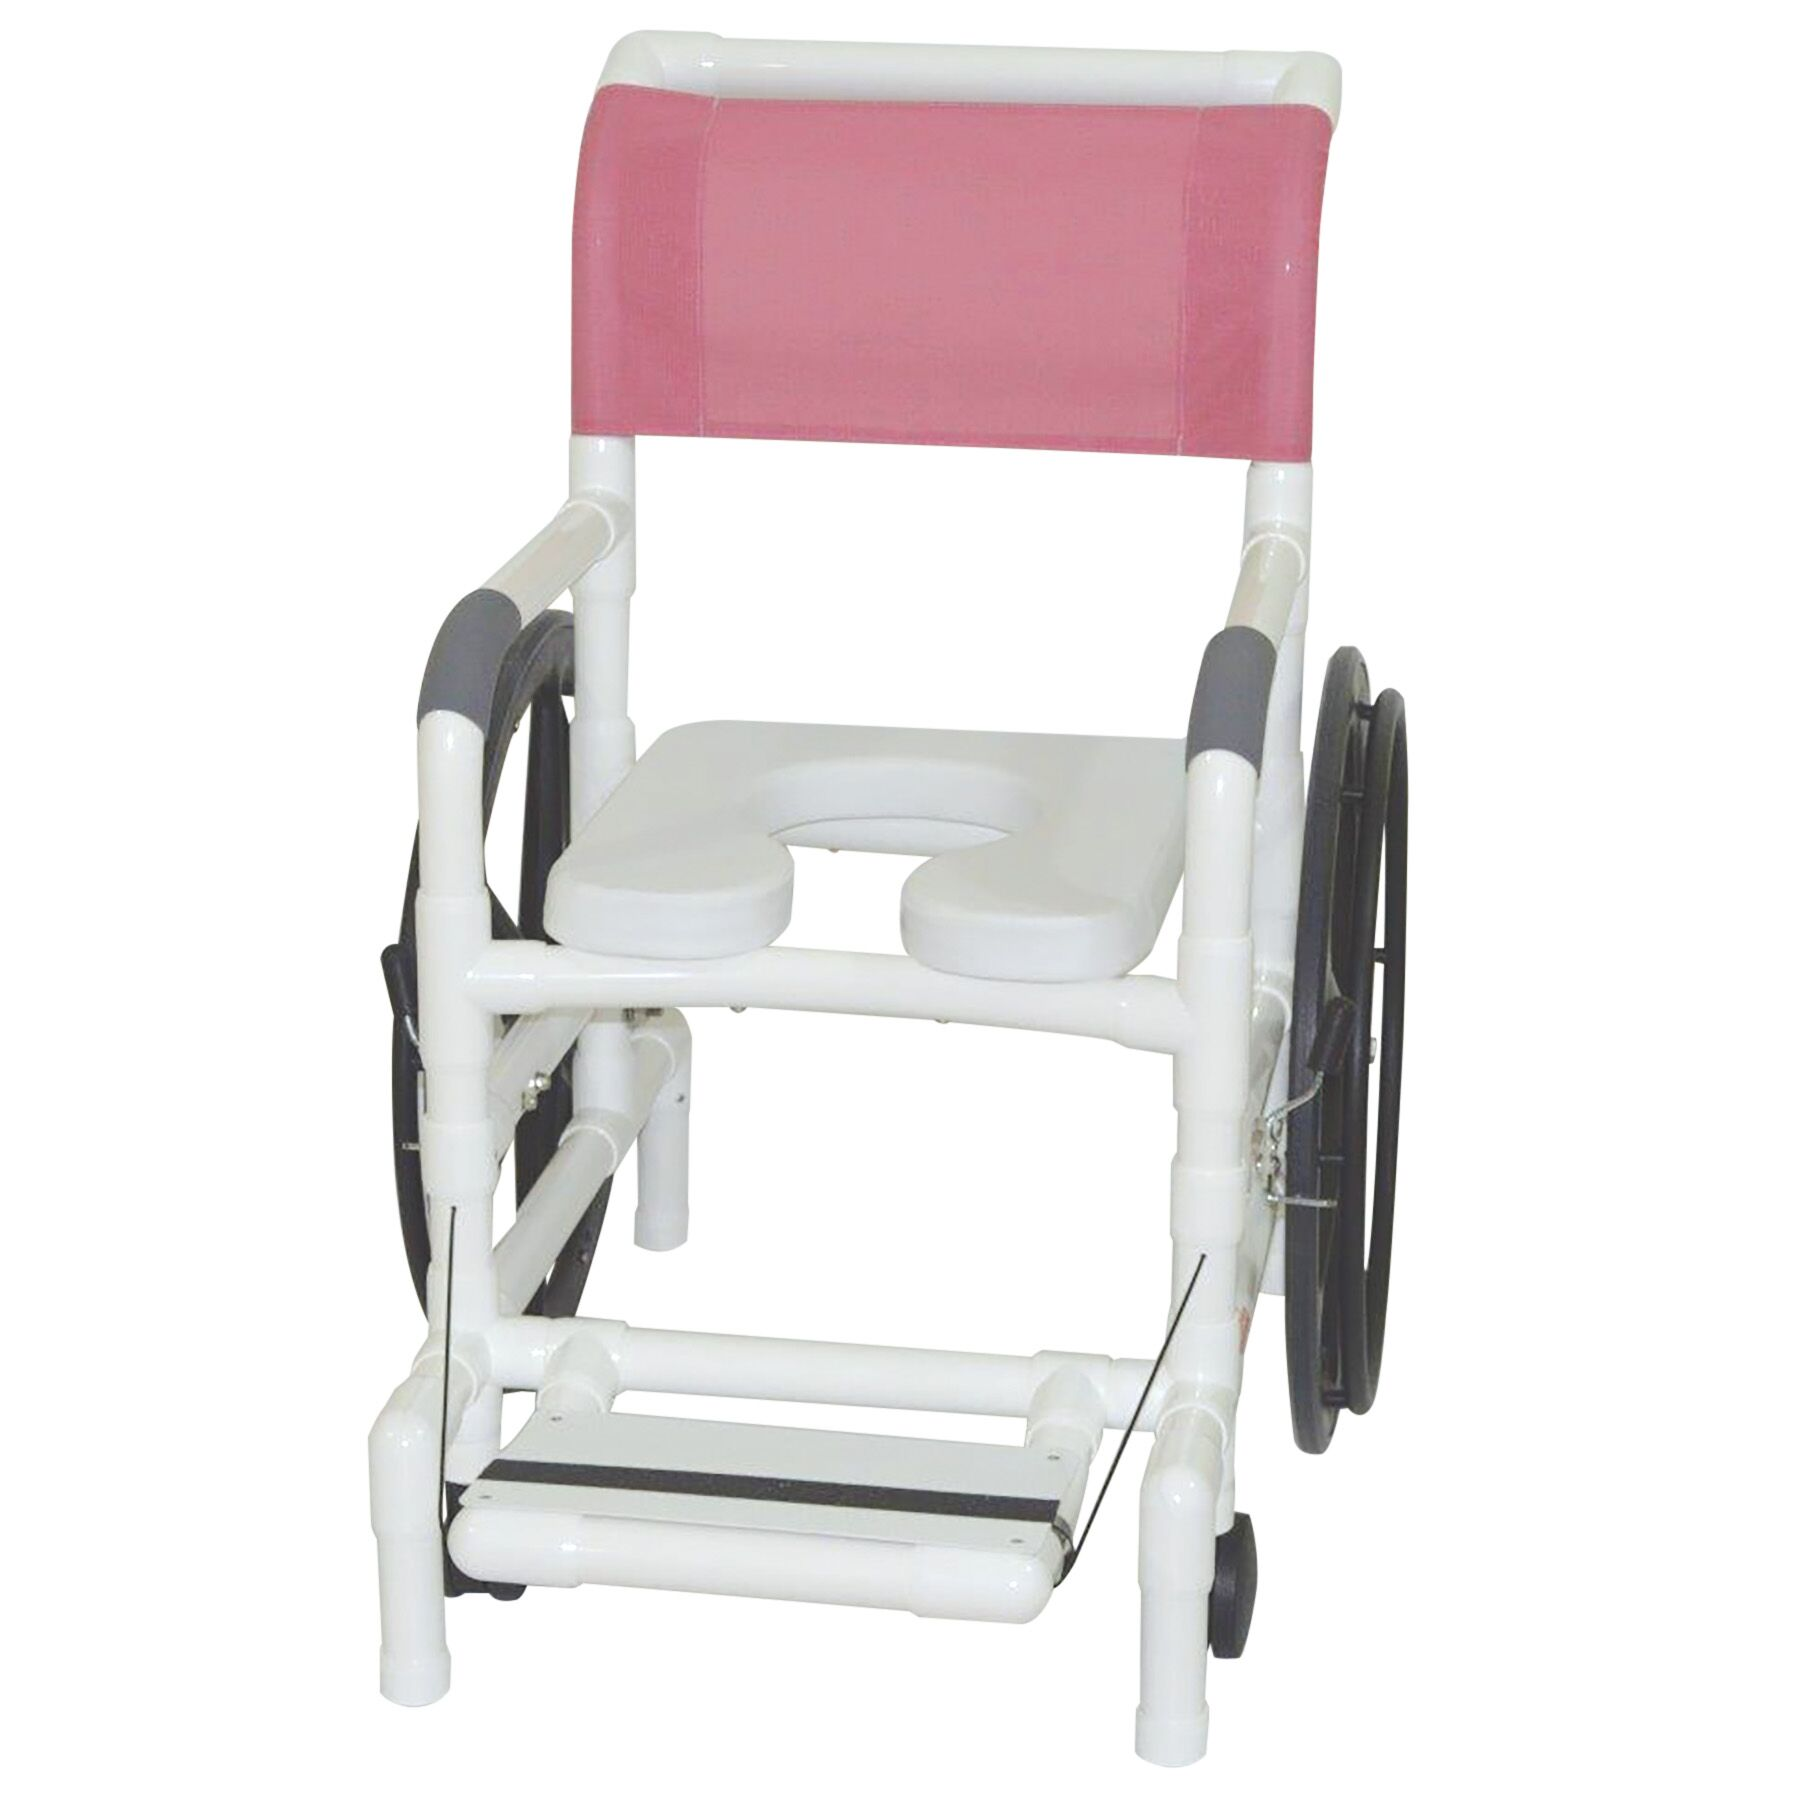 18″ Multi-Purpose Shower/Transfer Chair